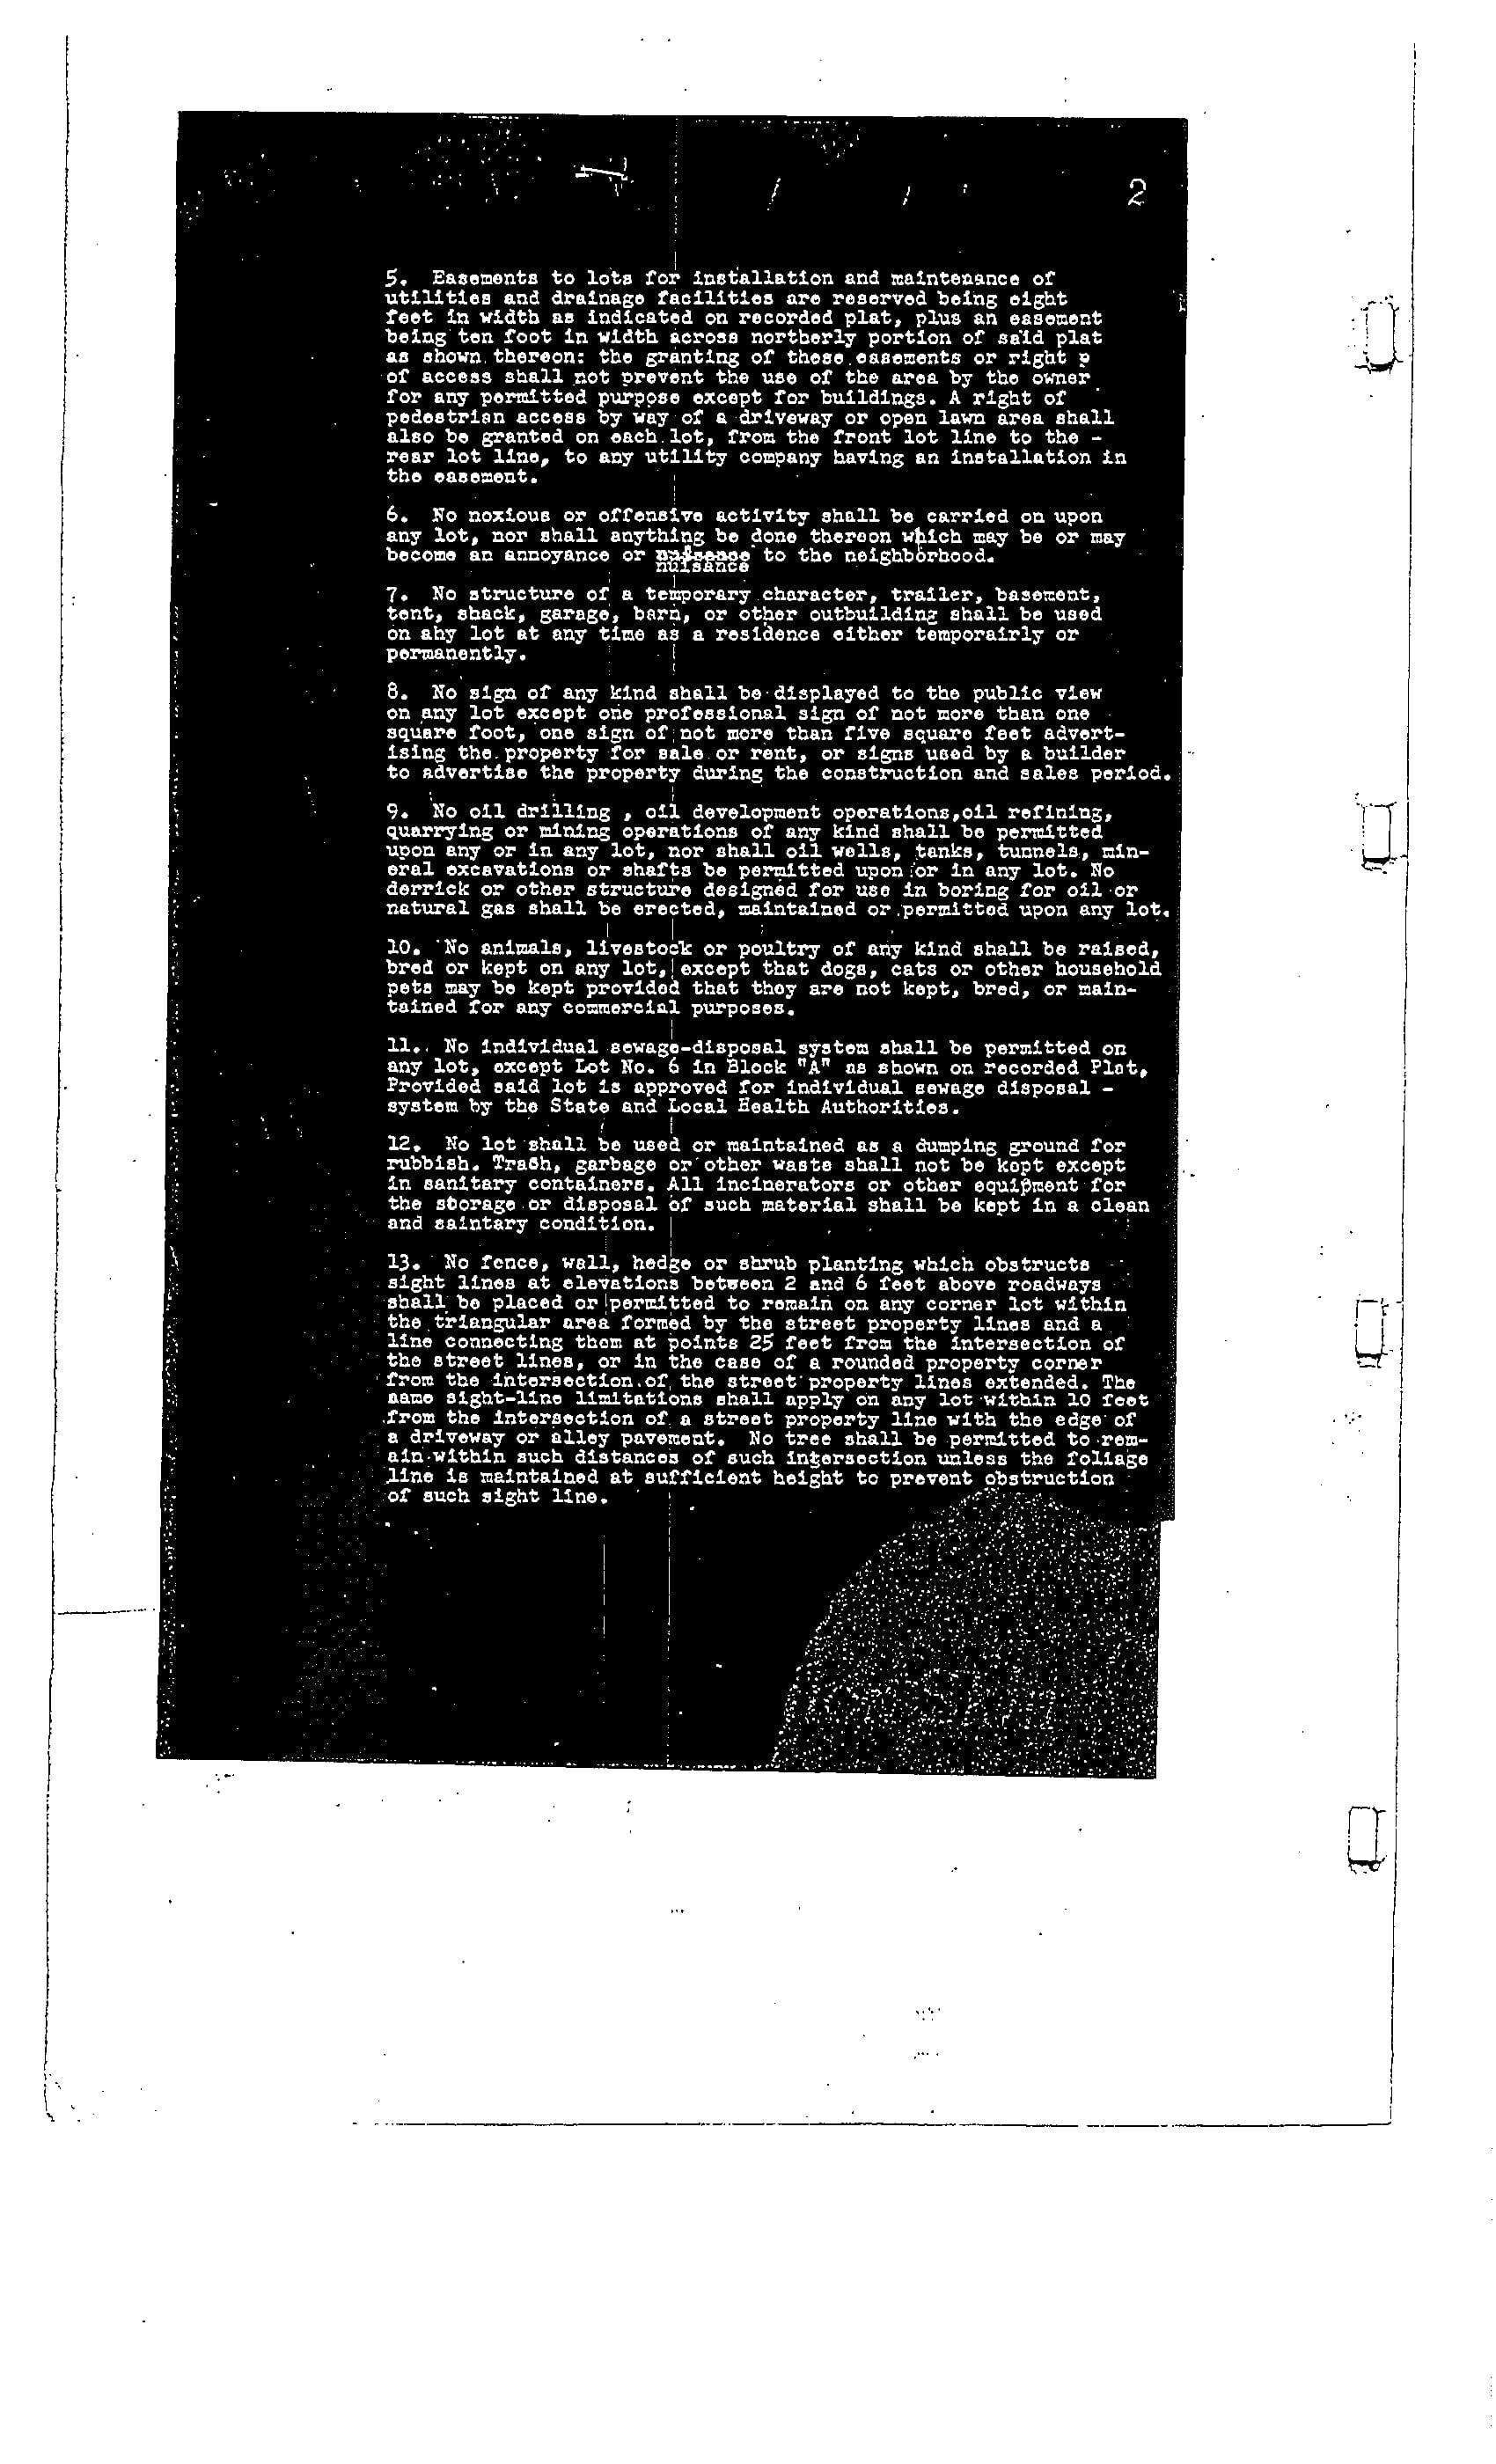 Covenants-City-Lake-Subdivision-Franklin-Co-2.jpg